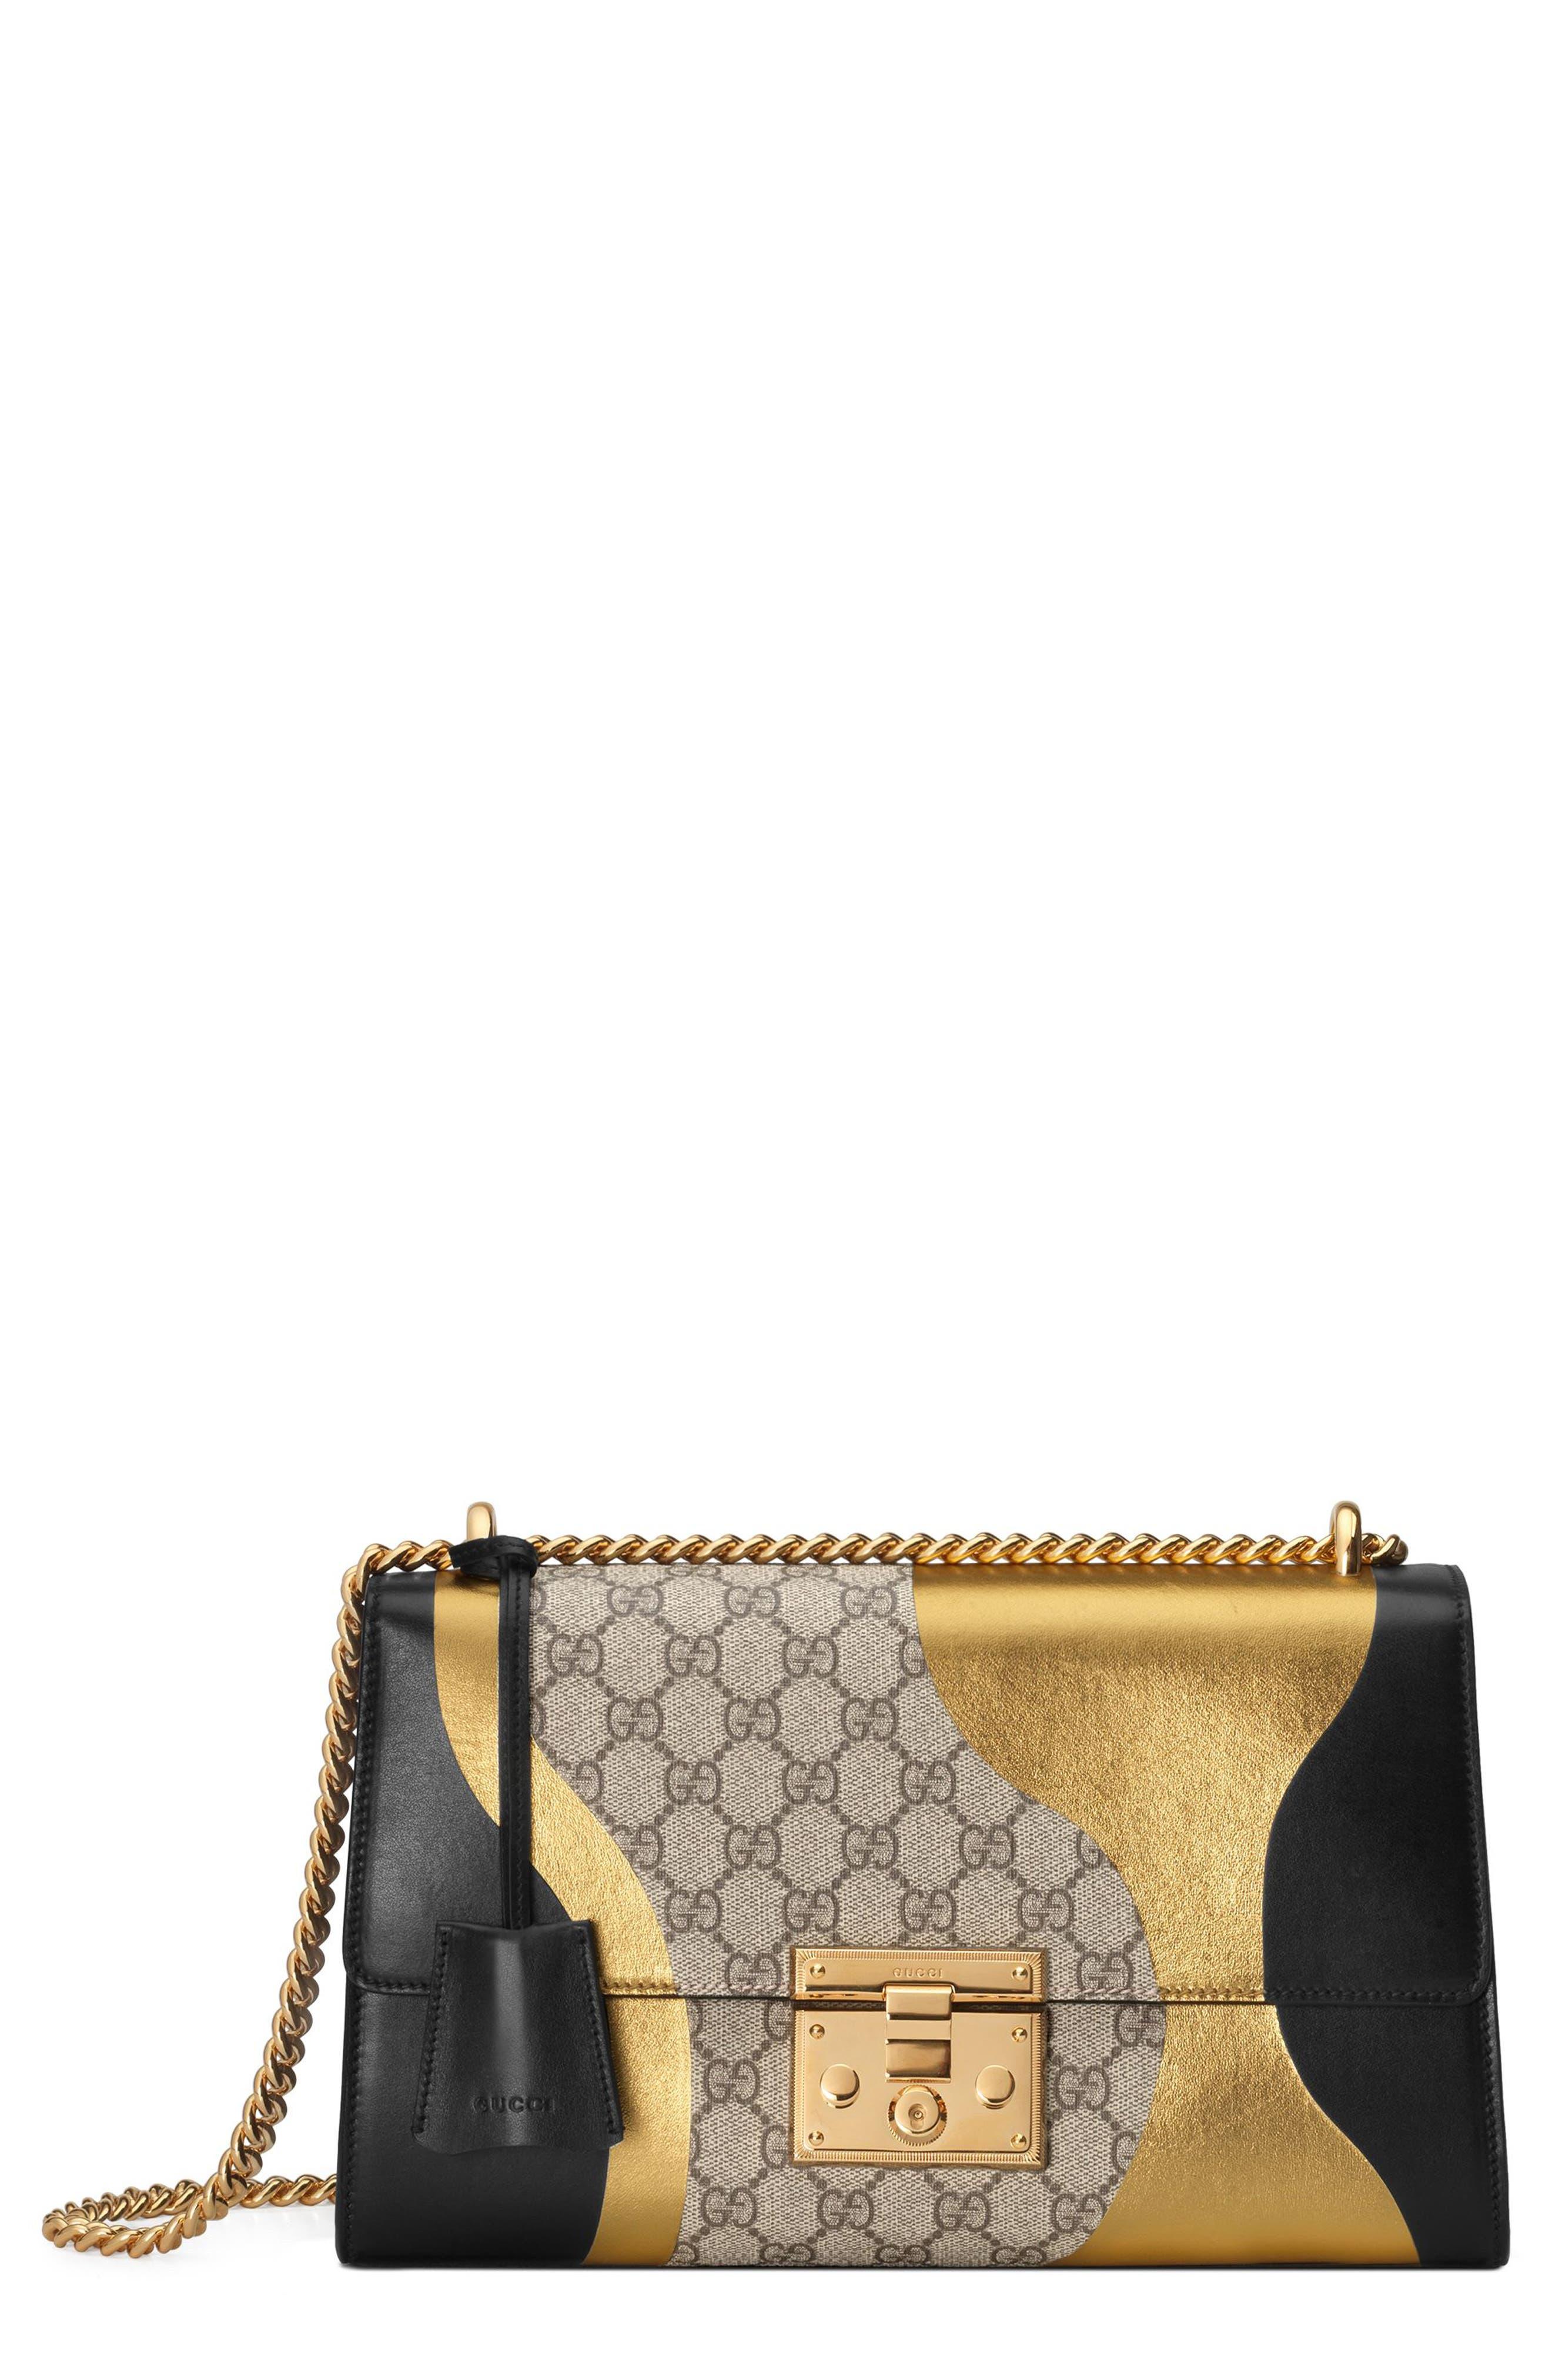 Medium Padlock GG Supreme Canvas & Leather Shoulder Bag,                             Main thumbnail 1, color,                             NERO/ORO VECCHIO